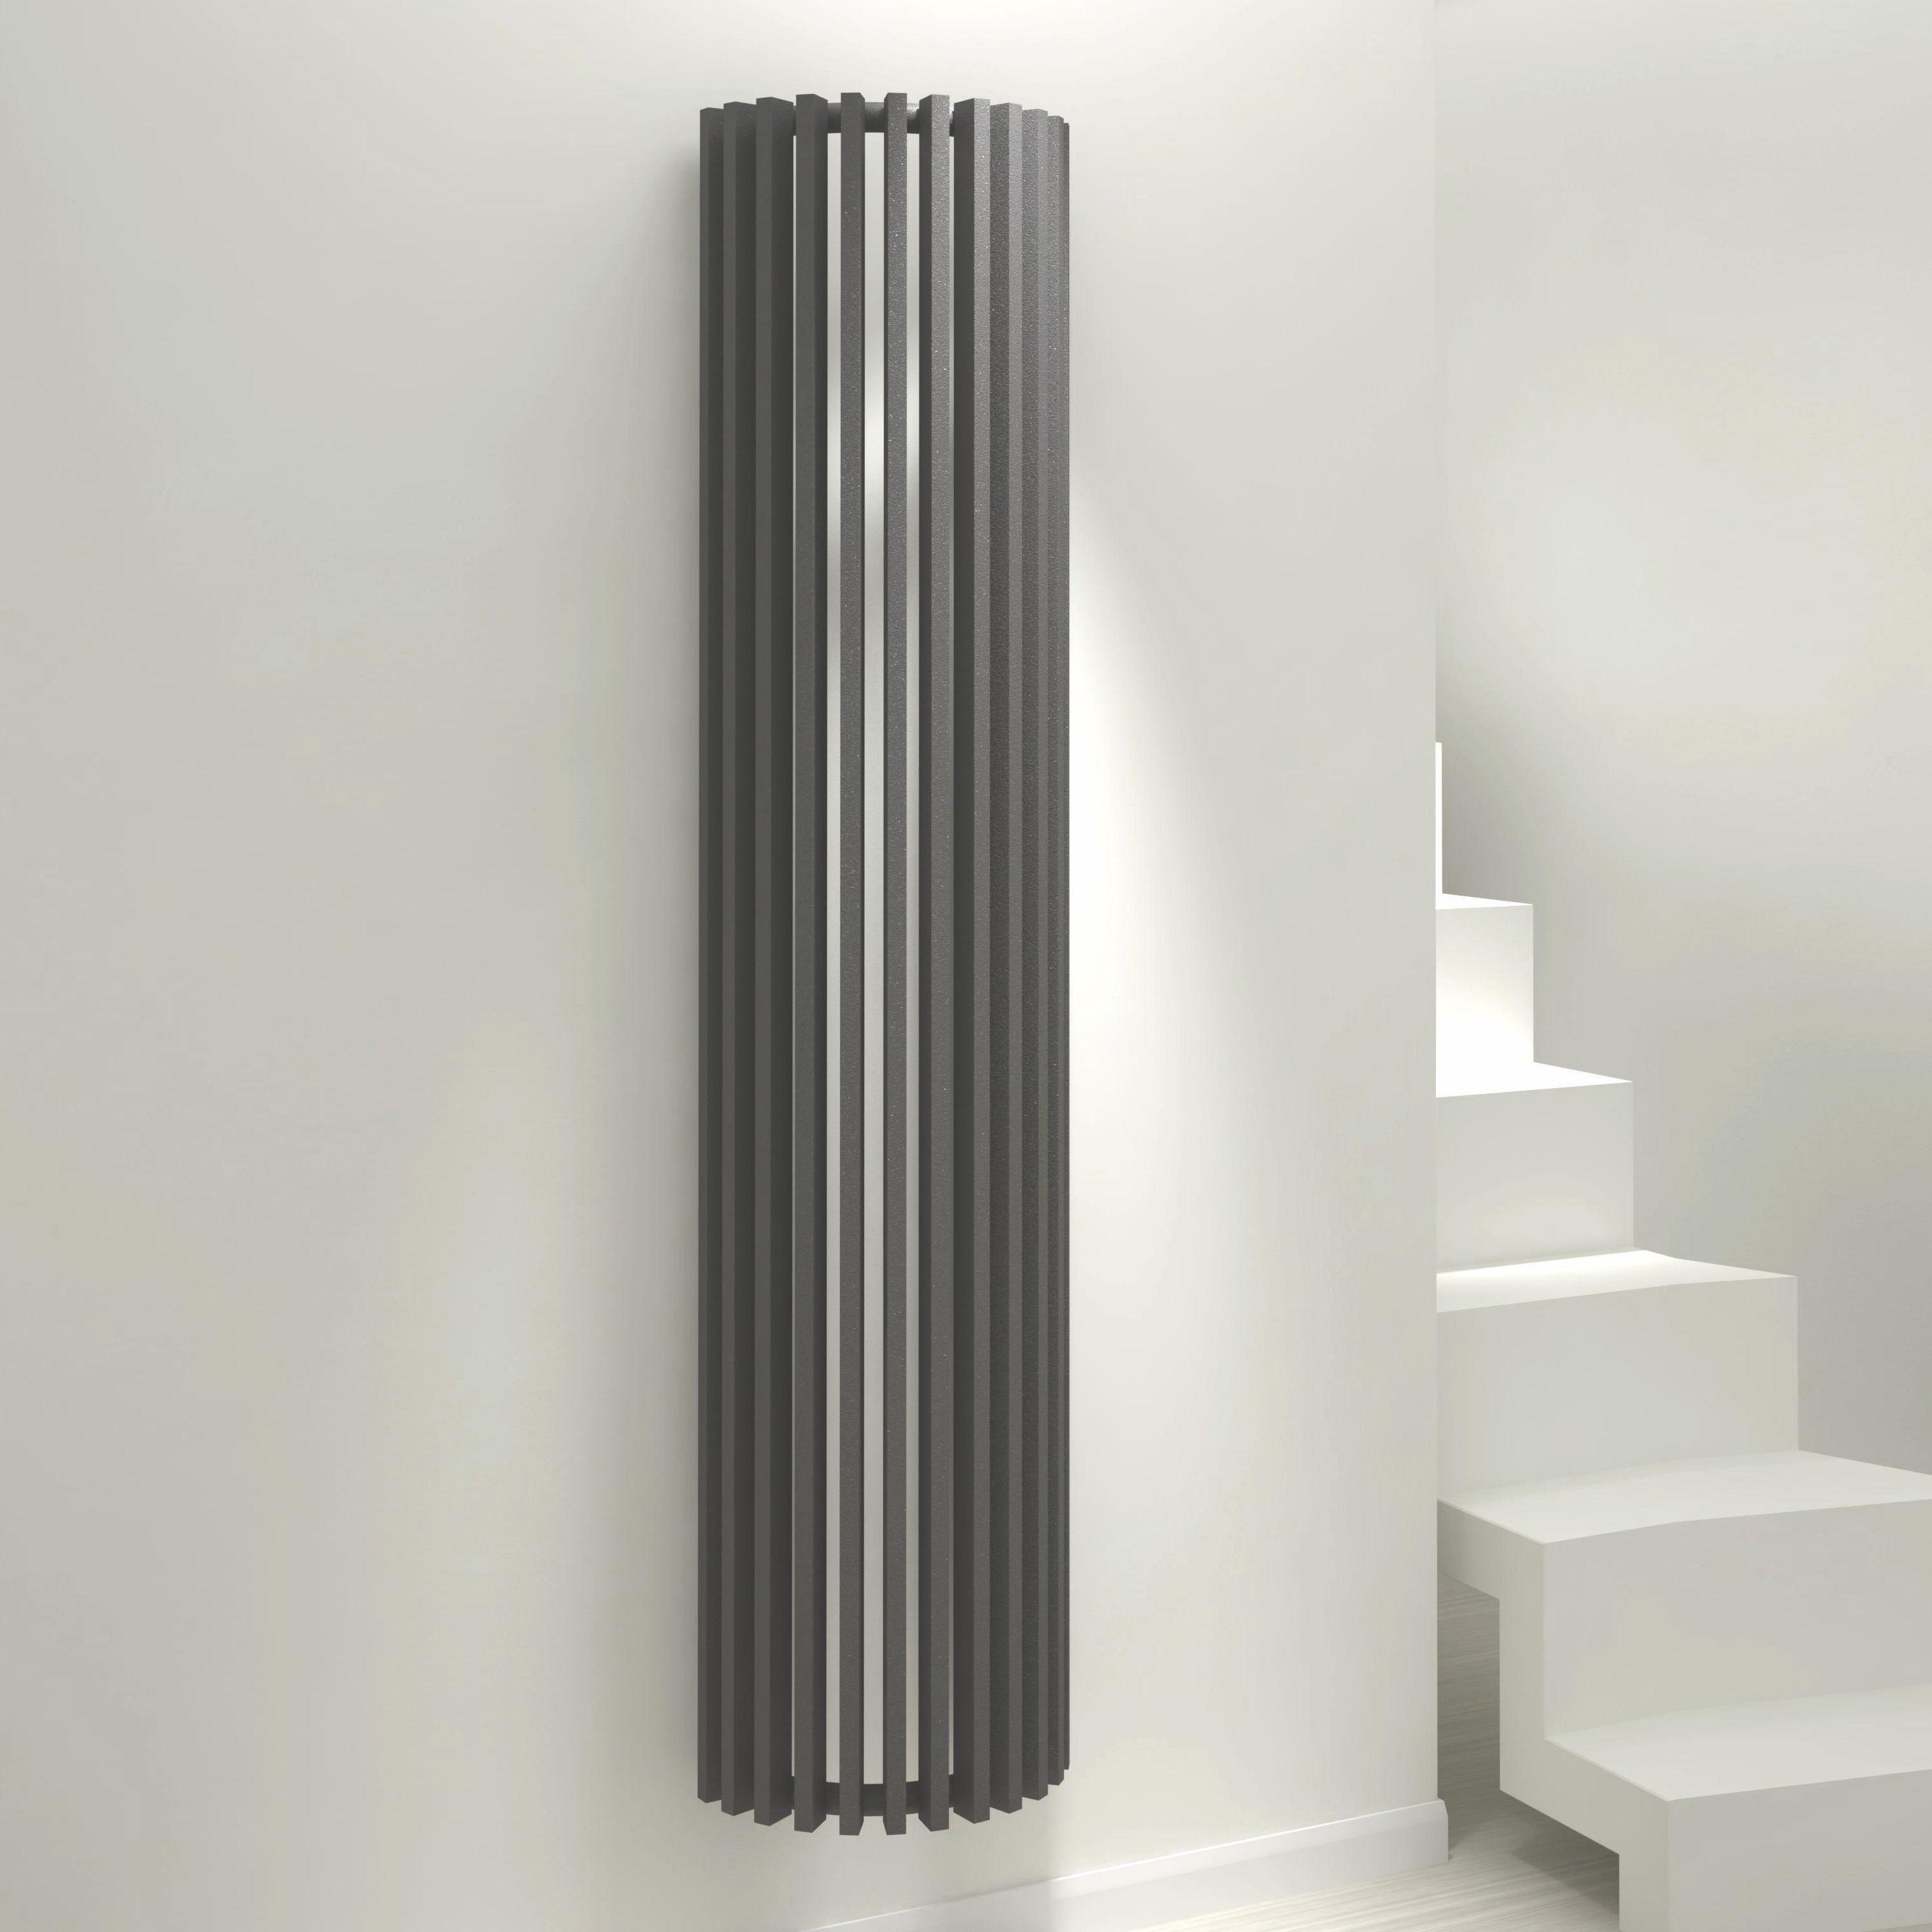 Kudox Tallos Vertical Radiator Anthracite (H)1800 mm (W)400